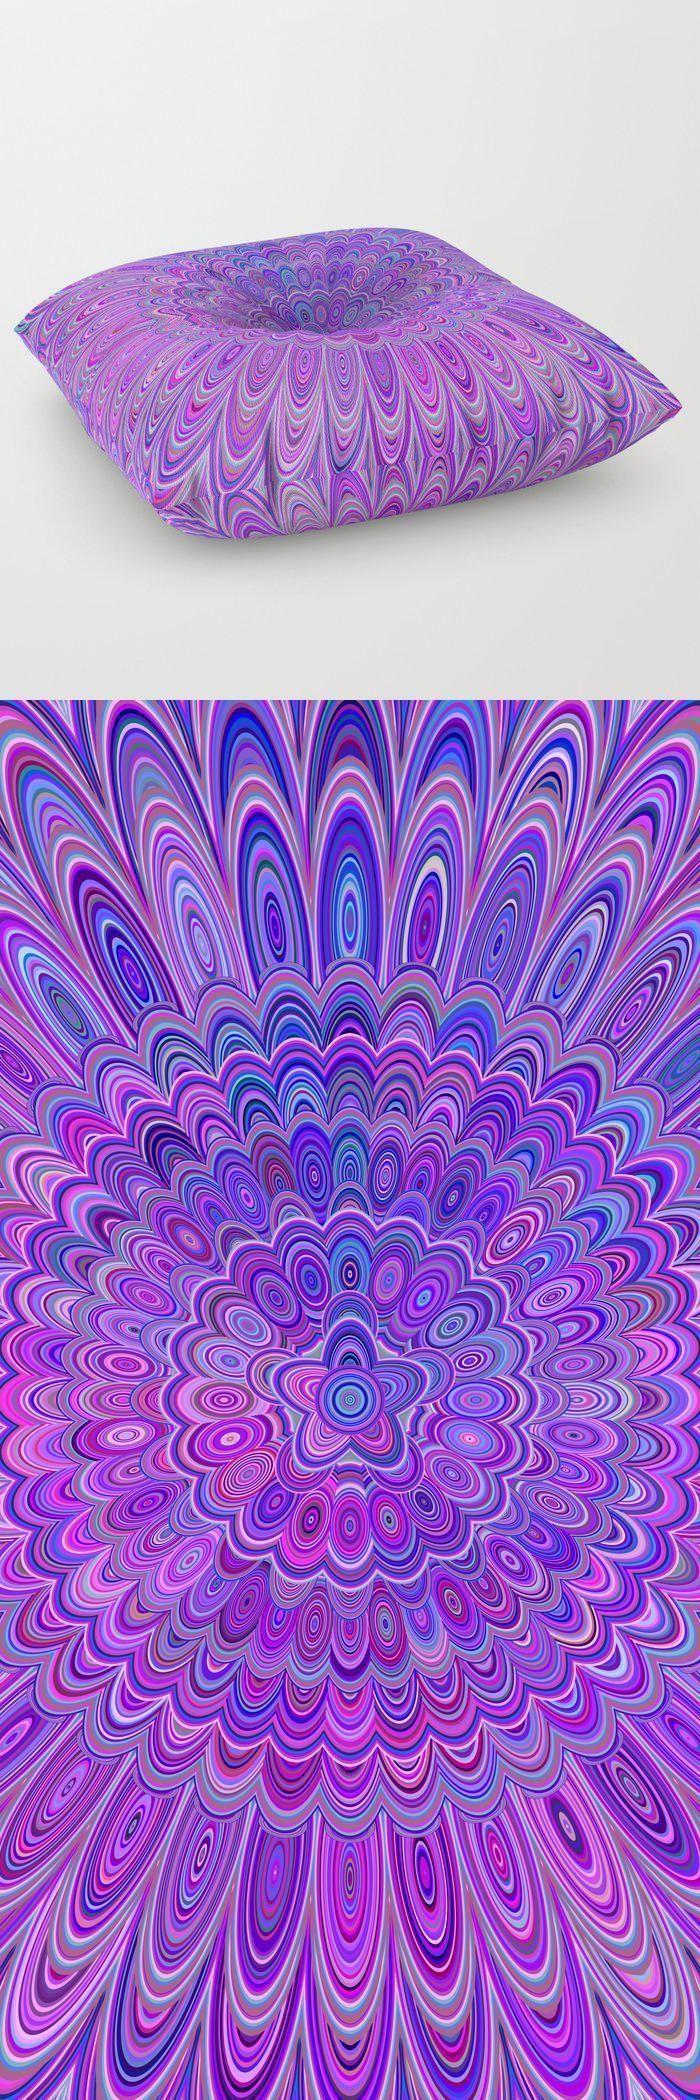 Purple Feather Magic Mandala Floor Pillow Purple Feather Magic Mandala Floor Pillow | purple boho pillow | boho pillows purple | Boho Pillow purple #MandalaPillow #purple #feather #mand #MandalaPillow #purple #feather #mandalas #floorpillow #feather #Floor #Magic #mand #Mandala #MandalaPillow #Pillow #Purple